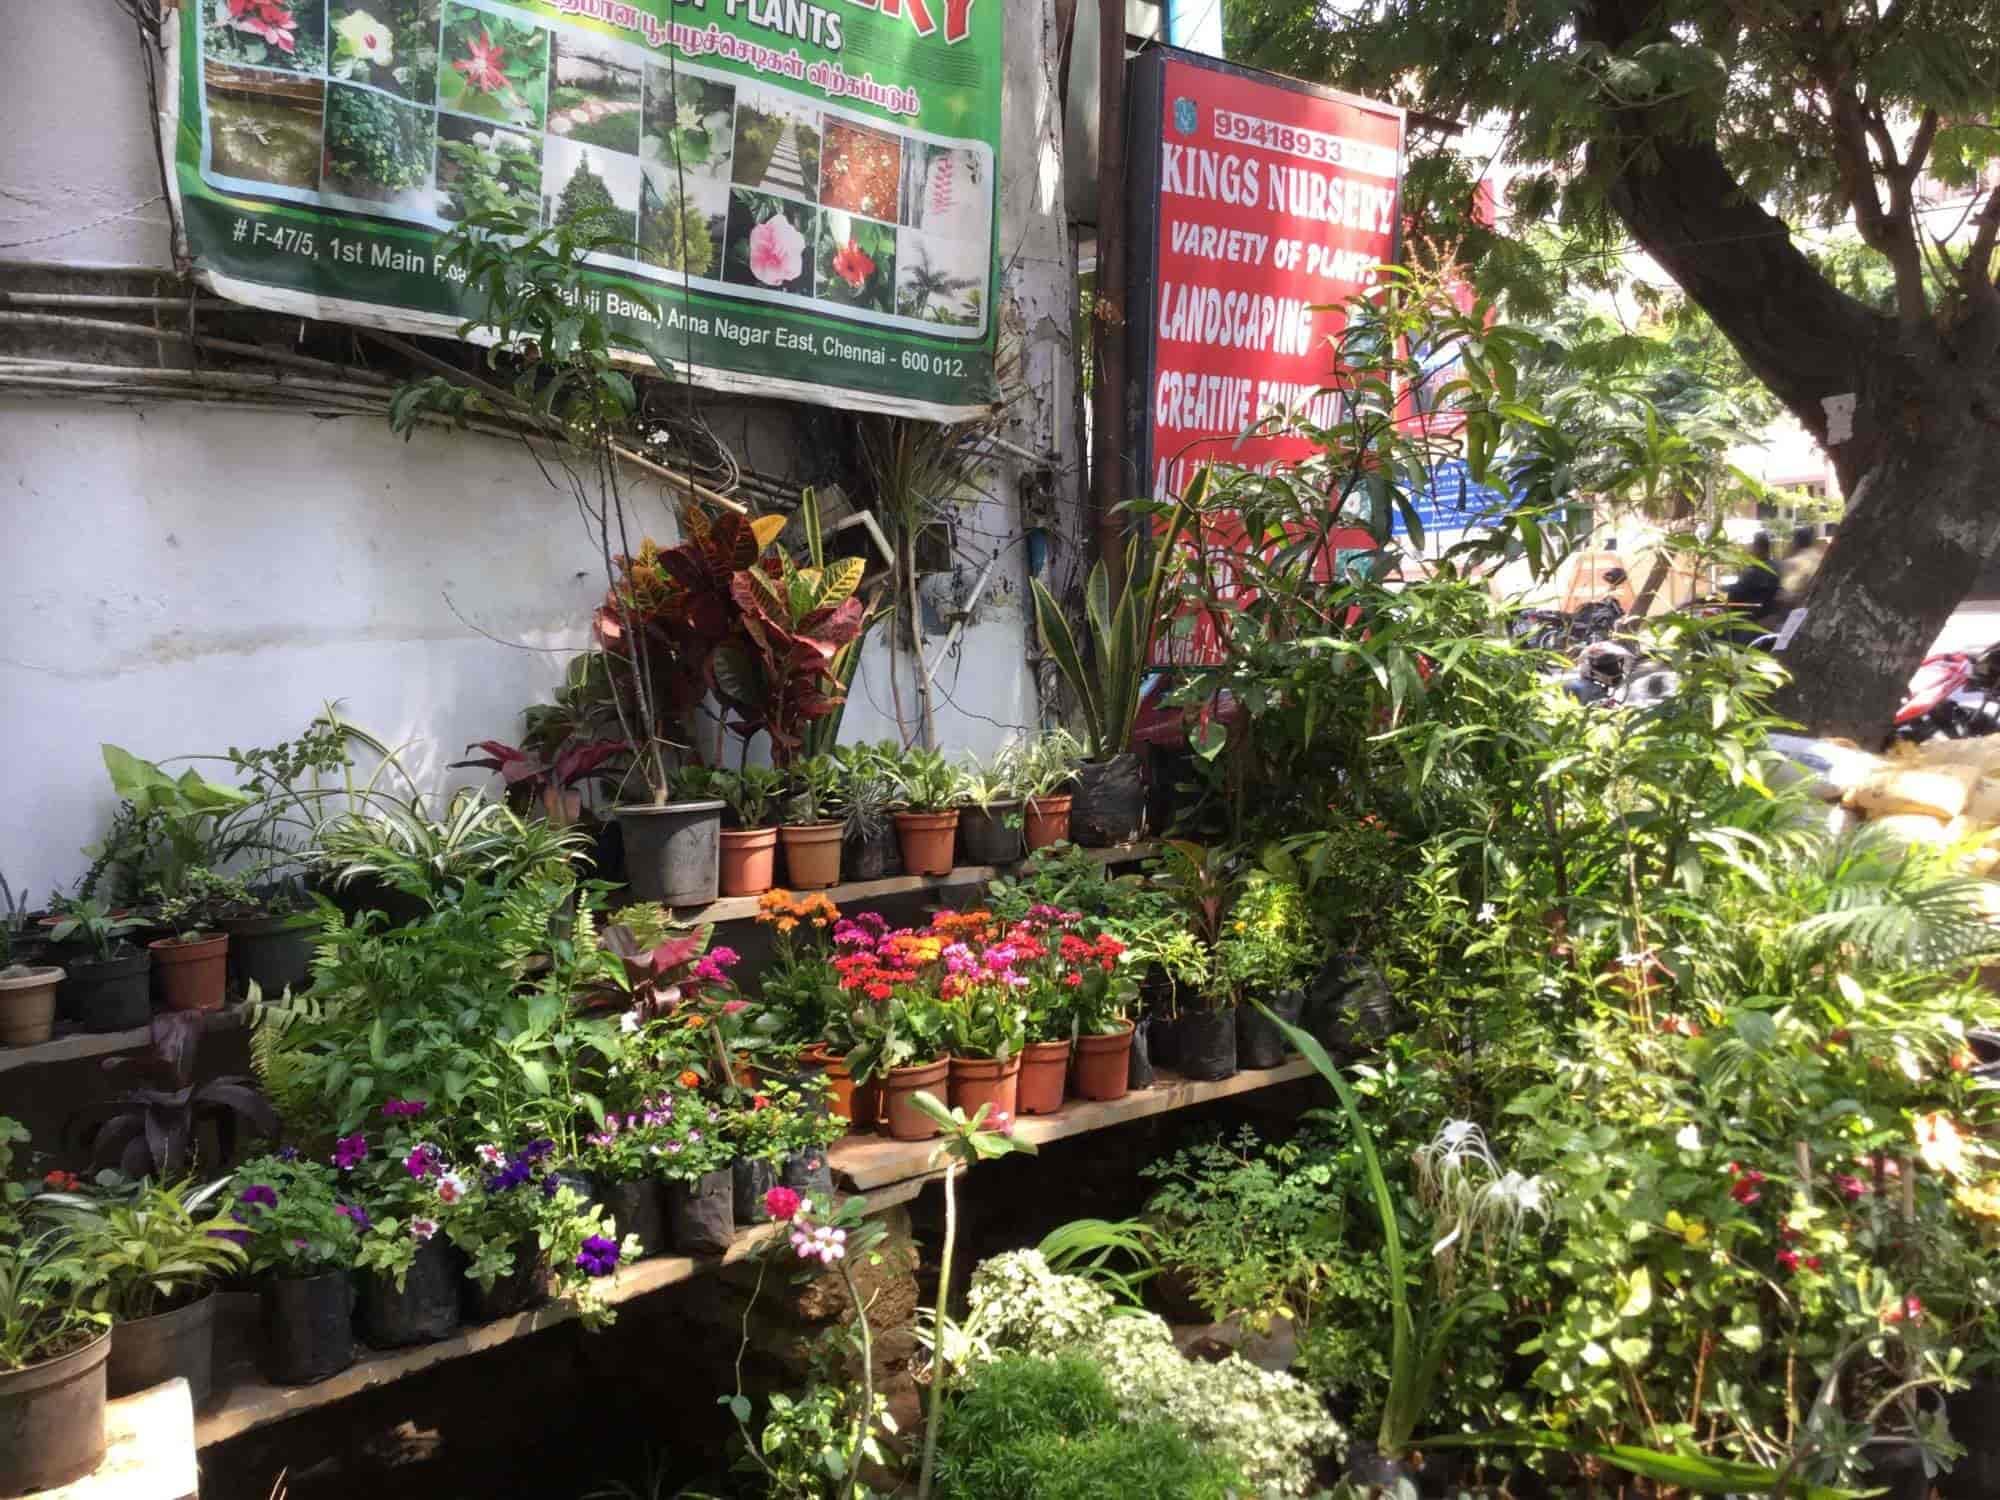 Kings Nursery Closed Down Photos Anna Nagar East Chennai Garden Maintenance